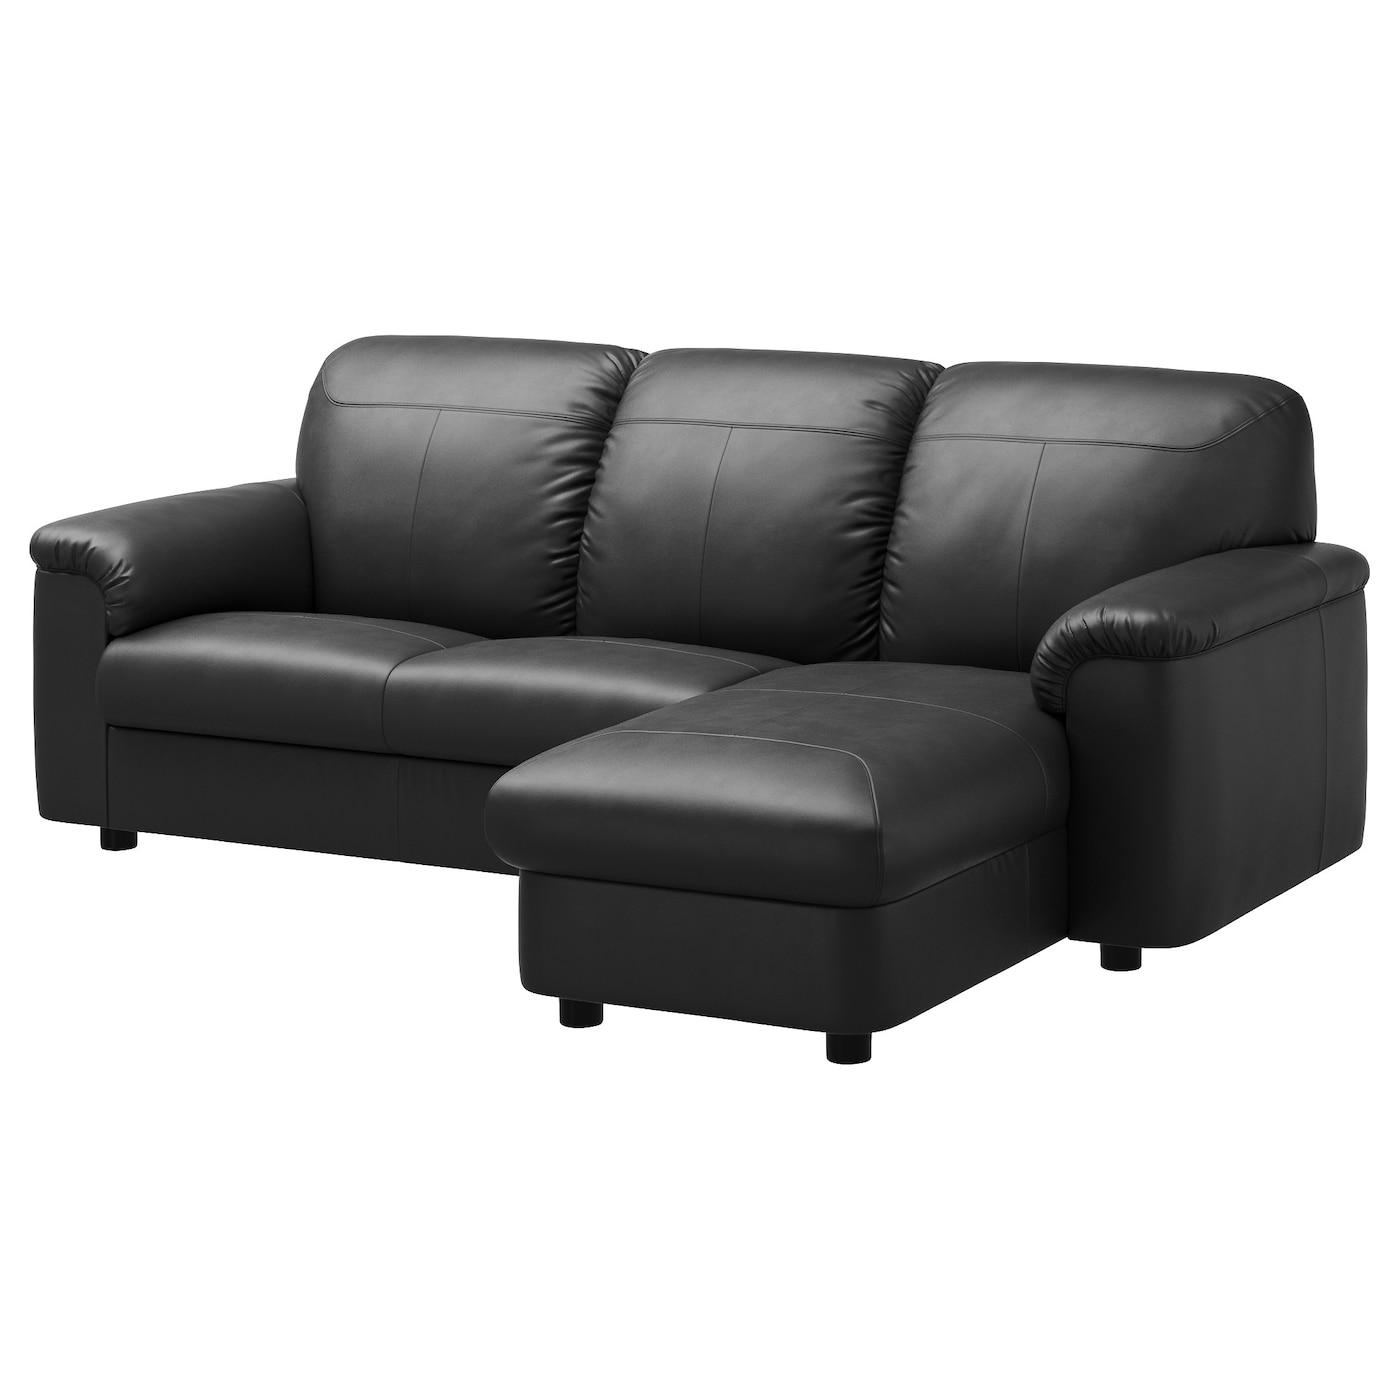 timsfors canap 2 places m ridienne mjuk kimstad noir ikea. Black Bedroom Furniture Sets. Home Design Ideas